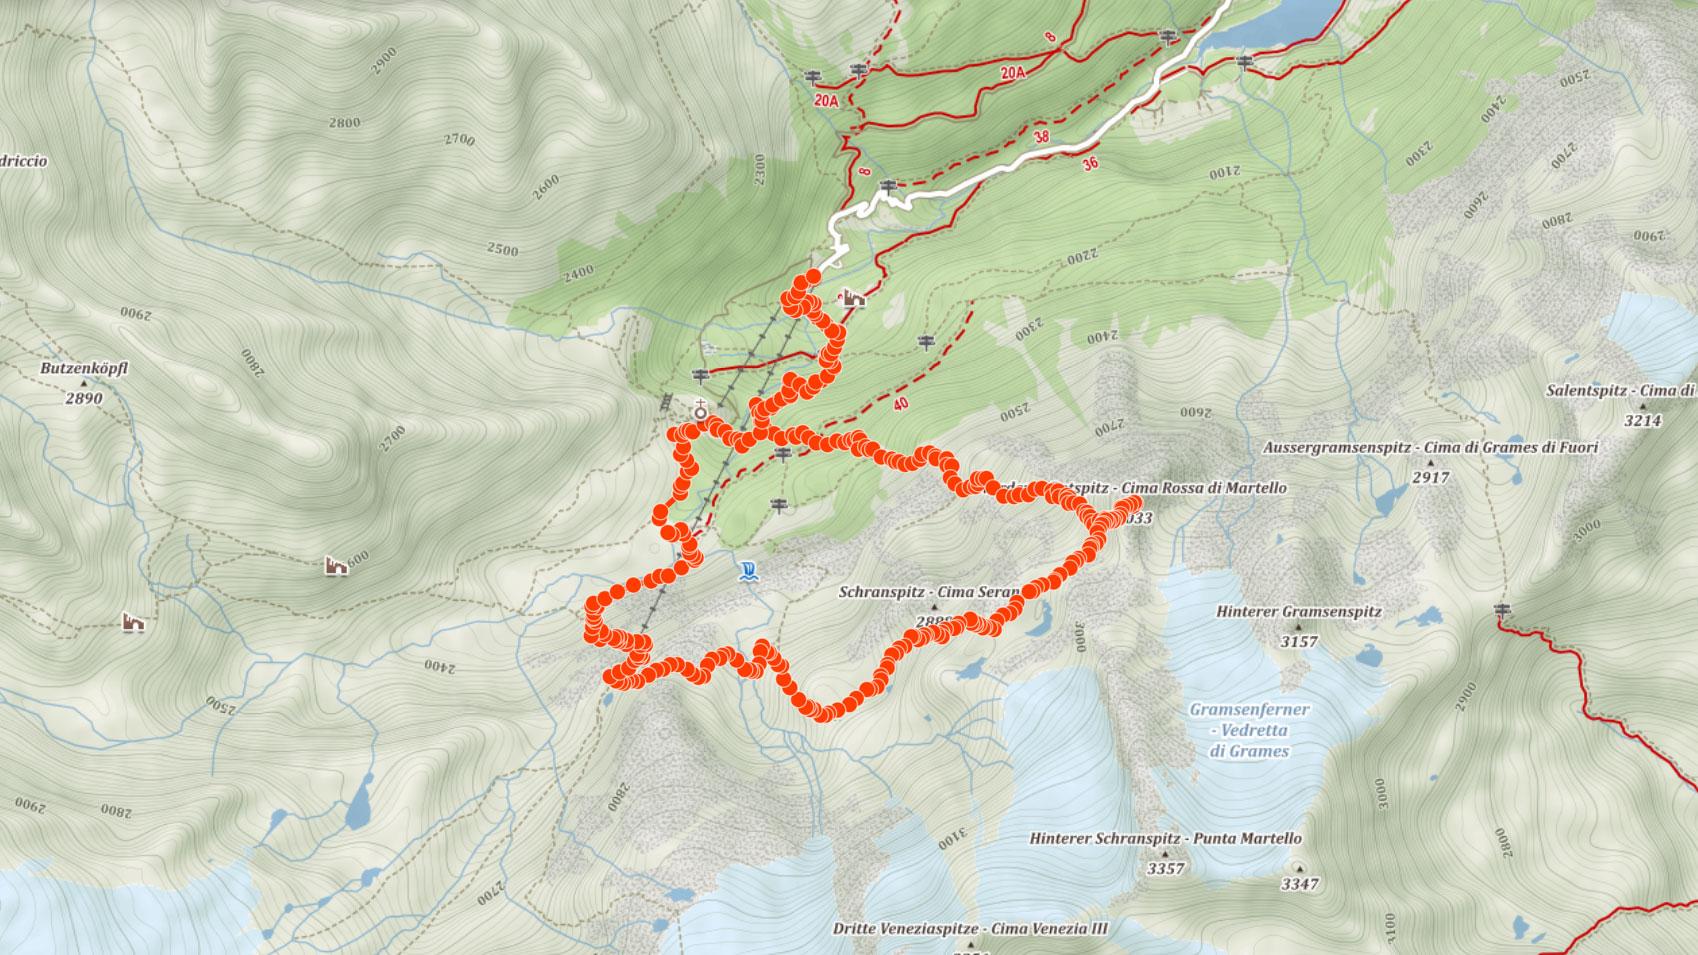 Trasa popisovaného výletu v italských Ortles s výstupem na Cima Rossa di Martello